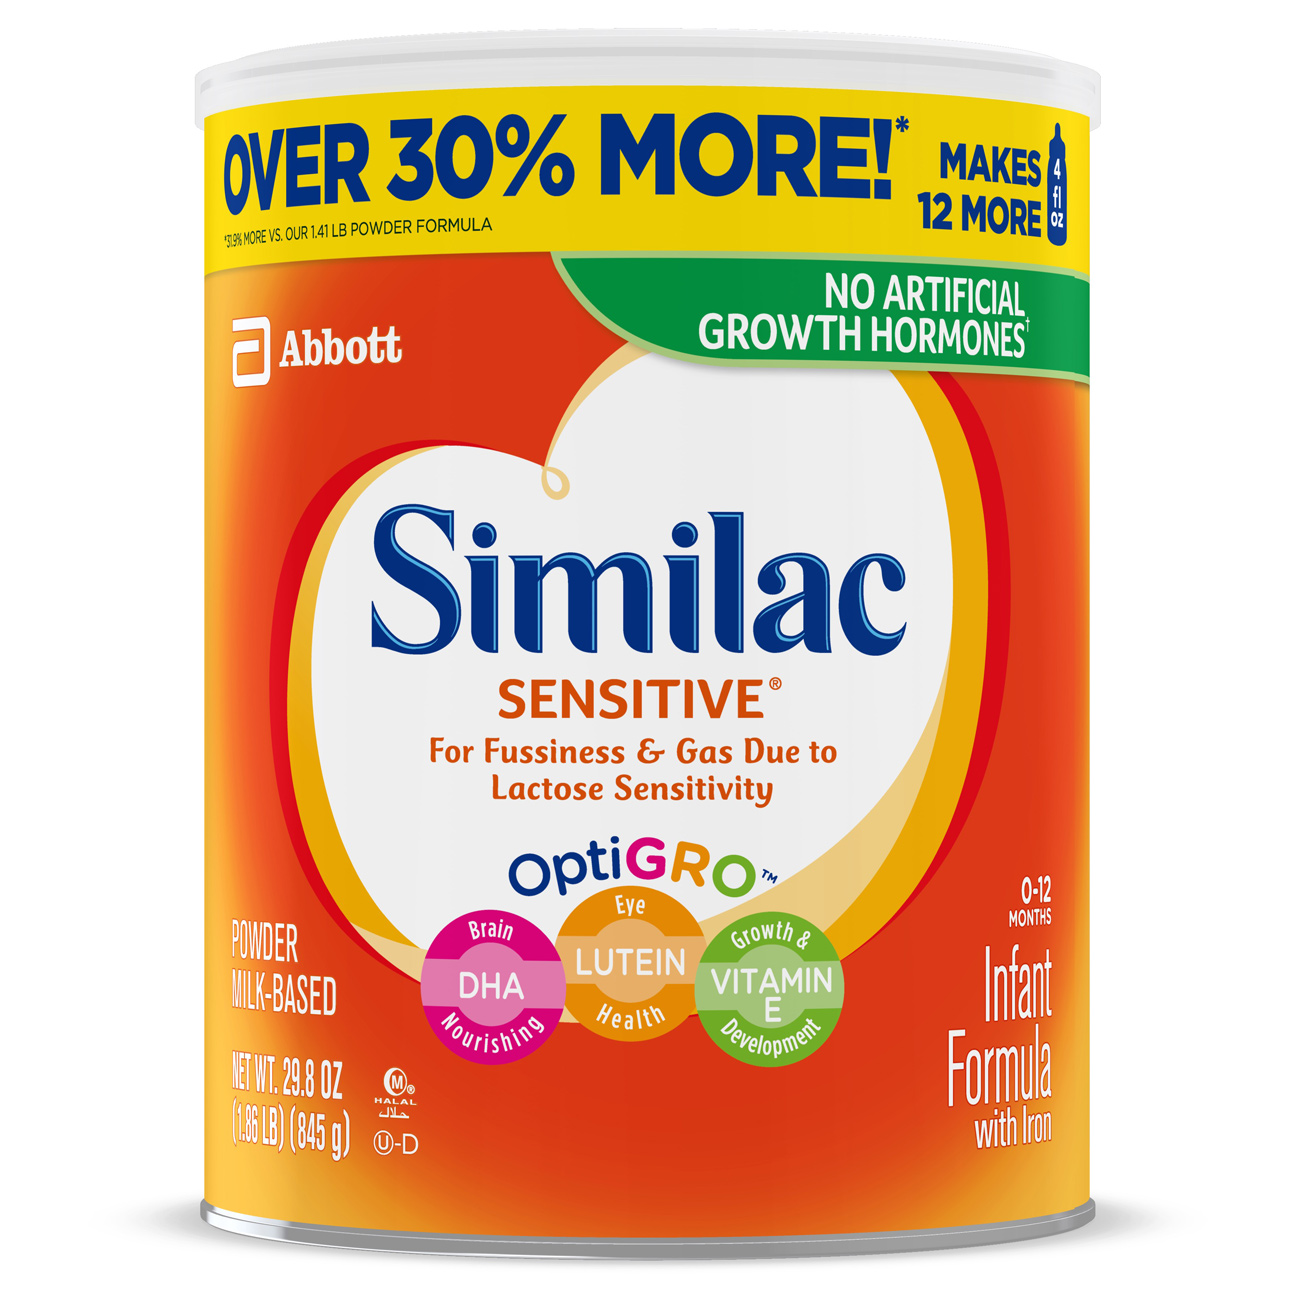 Similac Sensitive Infant Formula with Iron, Powder, 1.86 lb (Pack of 6)